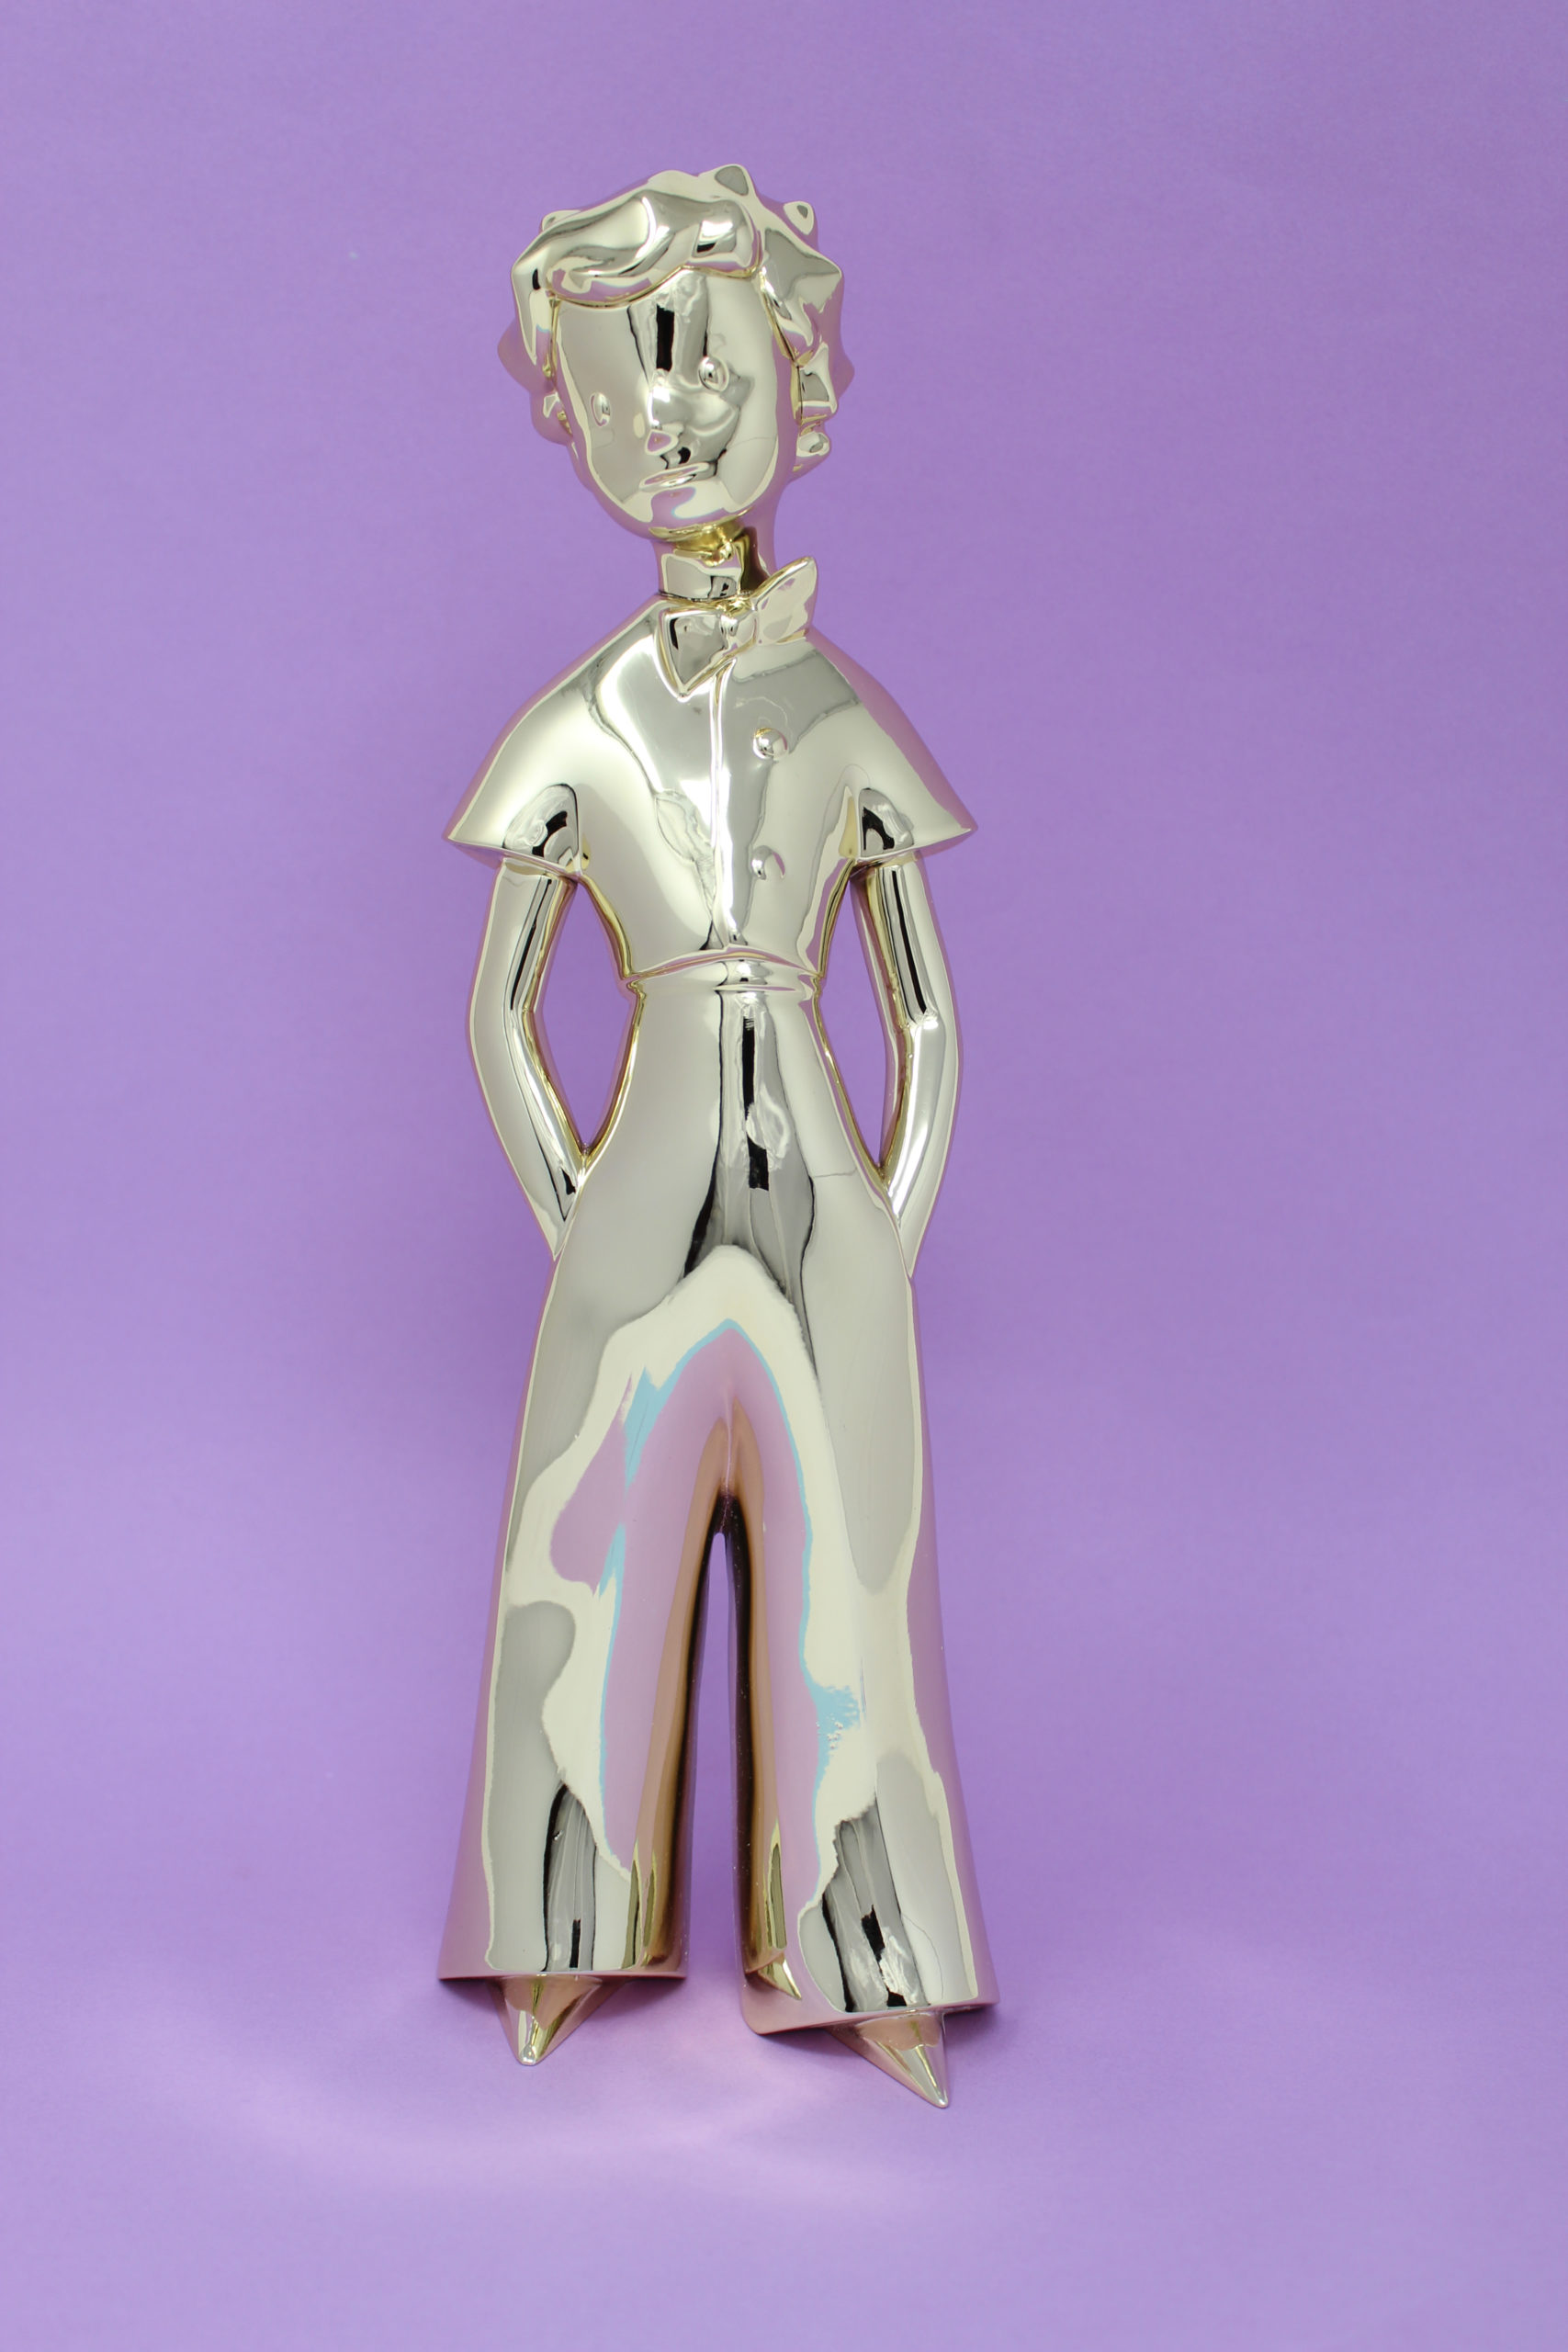 Maintenant disponible : Figurine Le Petit Prince Gold x Neamedia Icons